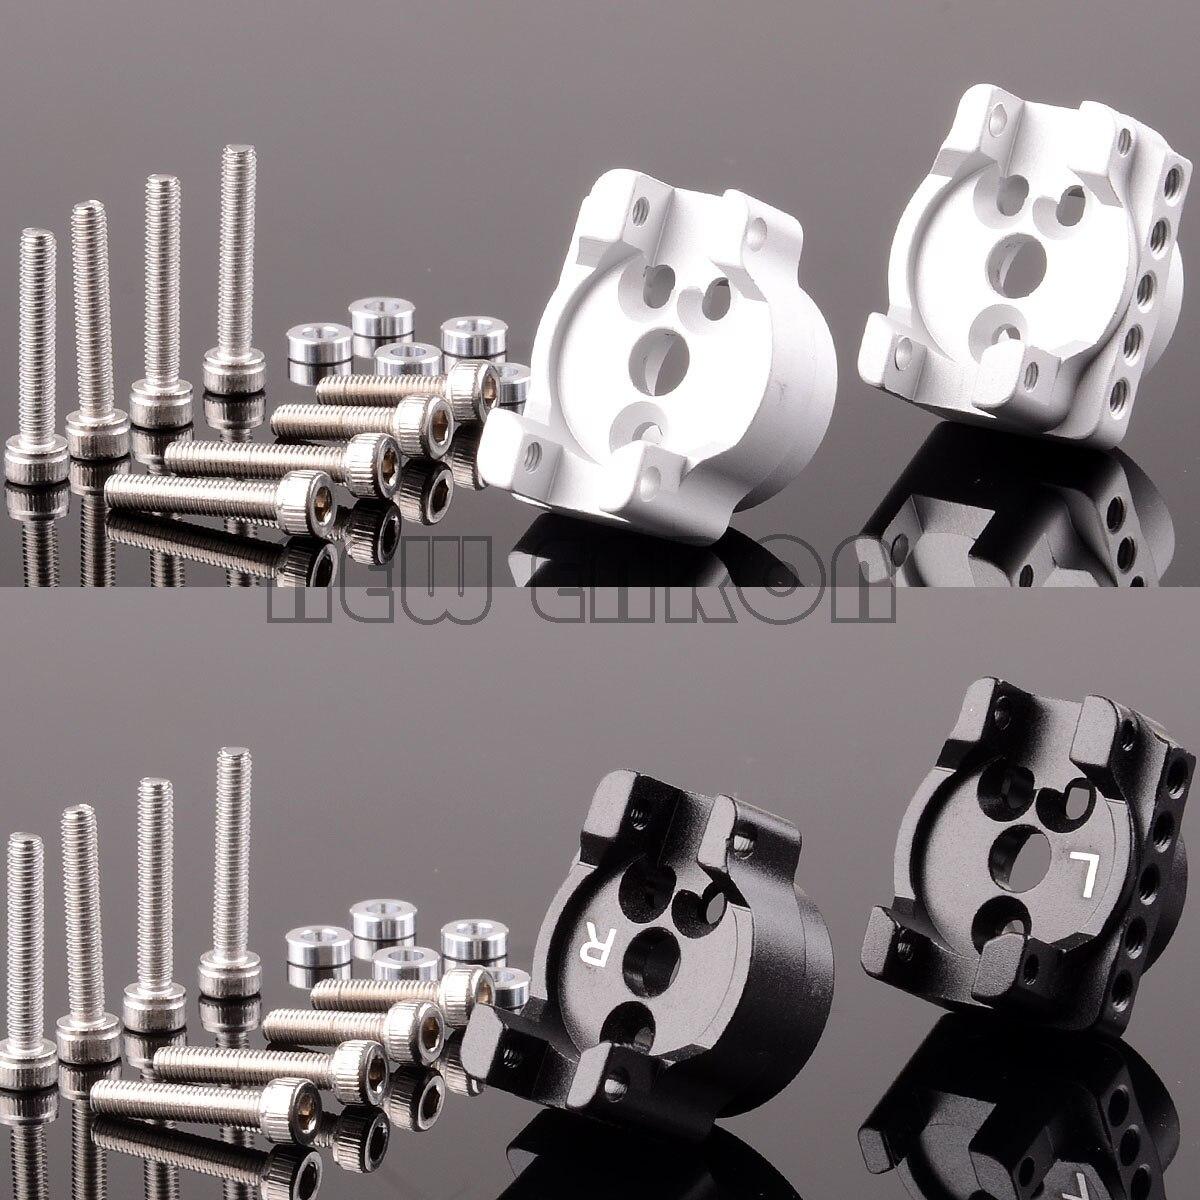 Nuevo ENRON 2P de aluminio Portal eje montaje #8256 parte trasera (L & R) para Traxxas 1/10 TRX-4 TRX4